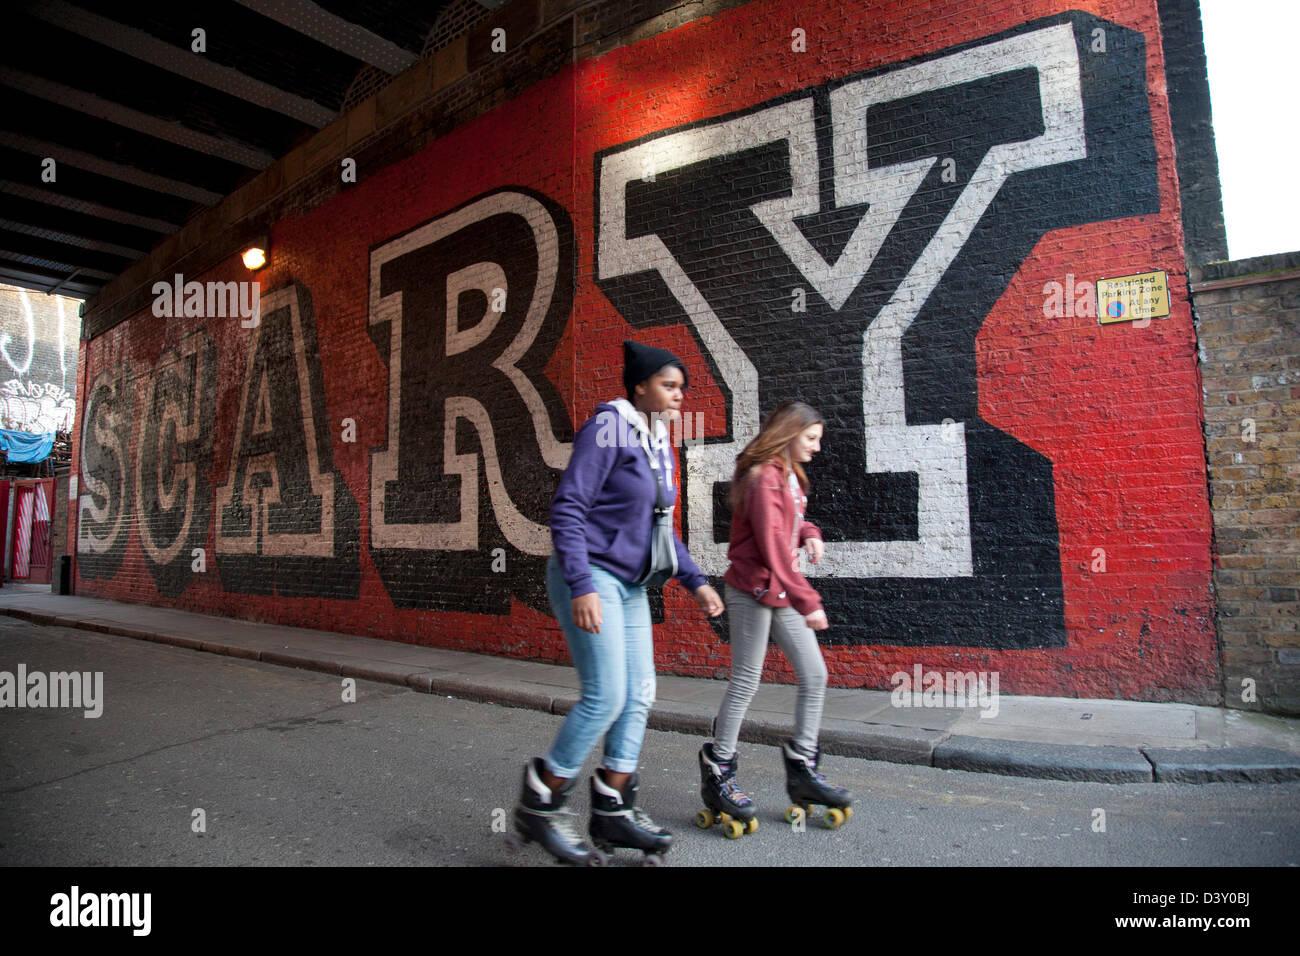 Sidewalk sport lane roller skate shoes - Urban Girls Rollerskate Past The Scary Street Art Mural By Ben Eine In Shoreditch East